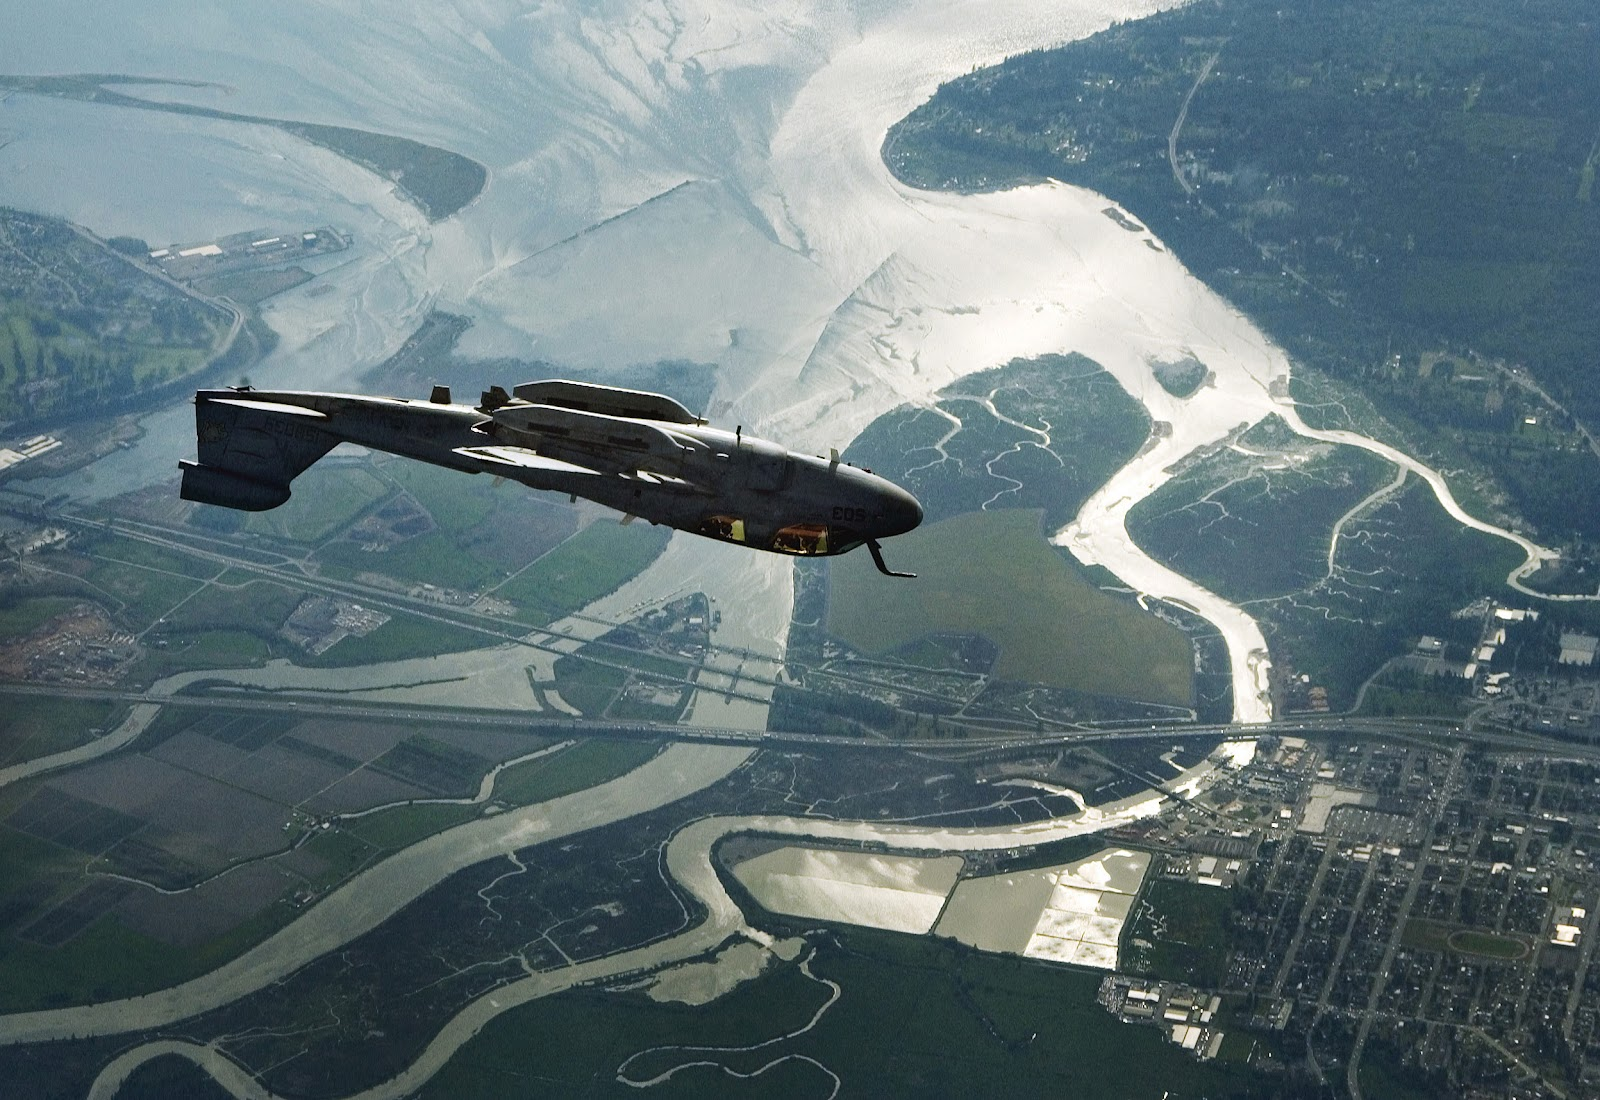 http://4.bp.blogspot.com/-aEBHksXnsR4/T3r1CUNhGjI/AAAAAAAAH08/gAqAi4UcOZY/s1600/EA6B_Prowler_inverted_flight.jpg